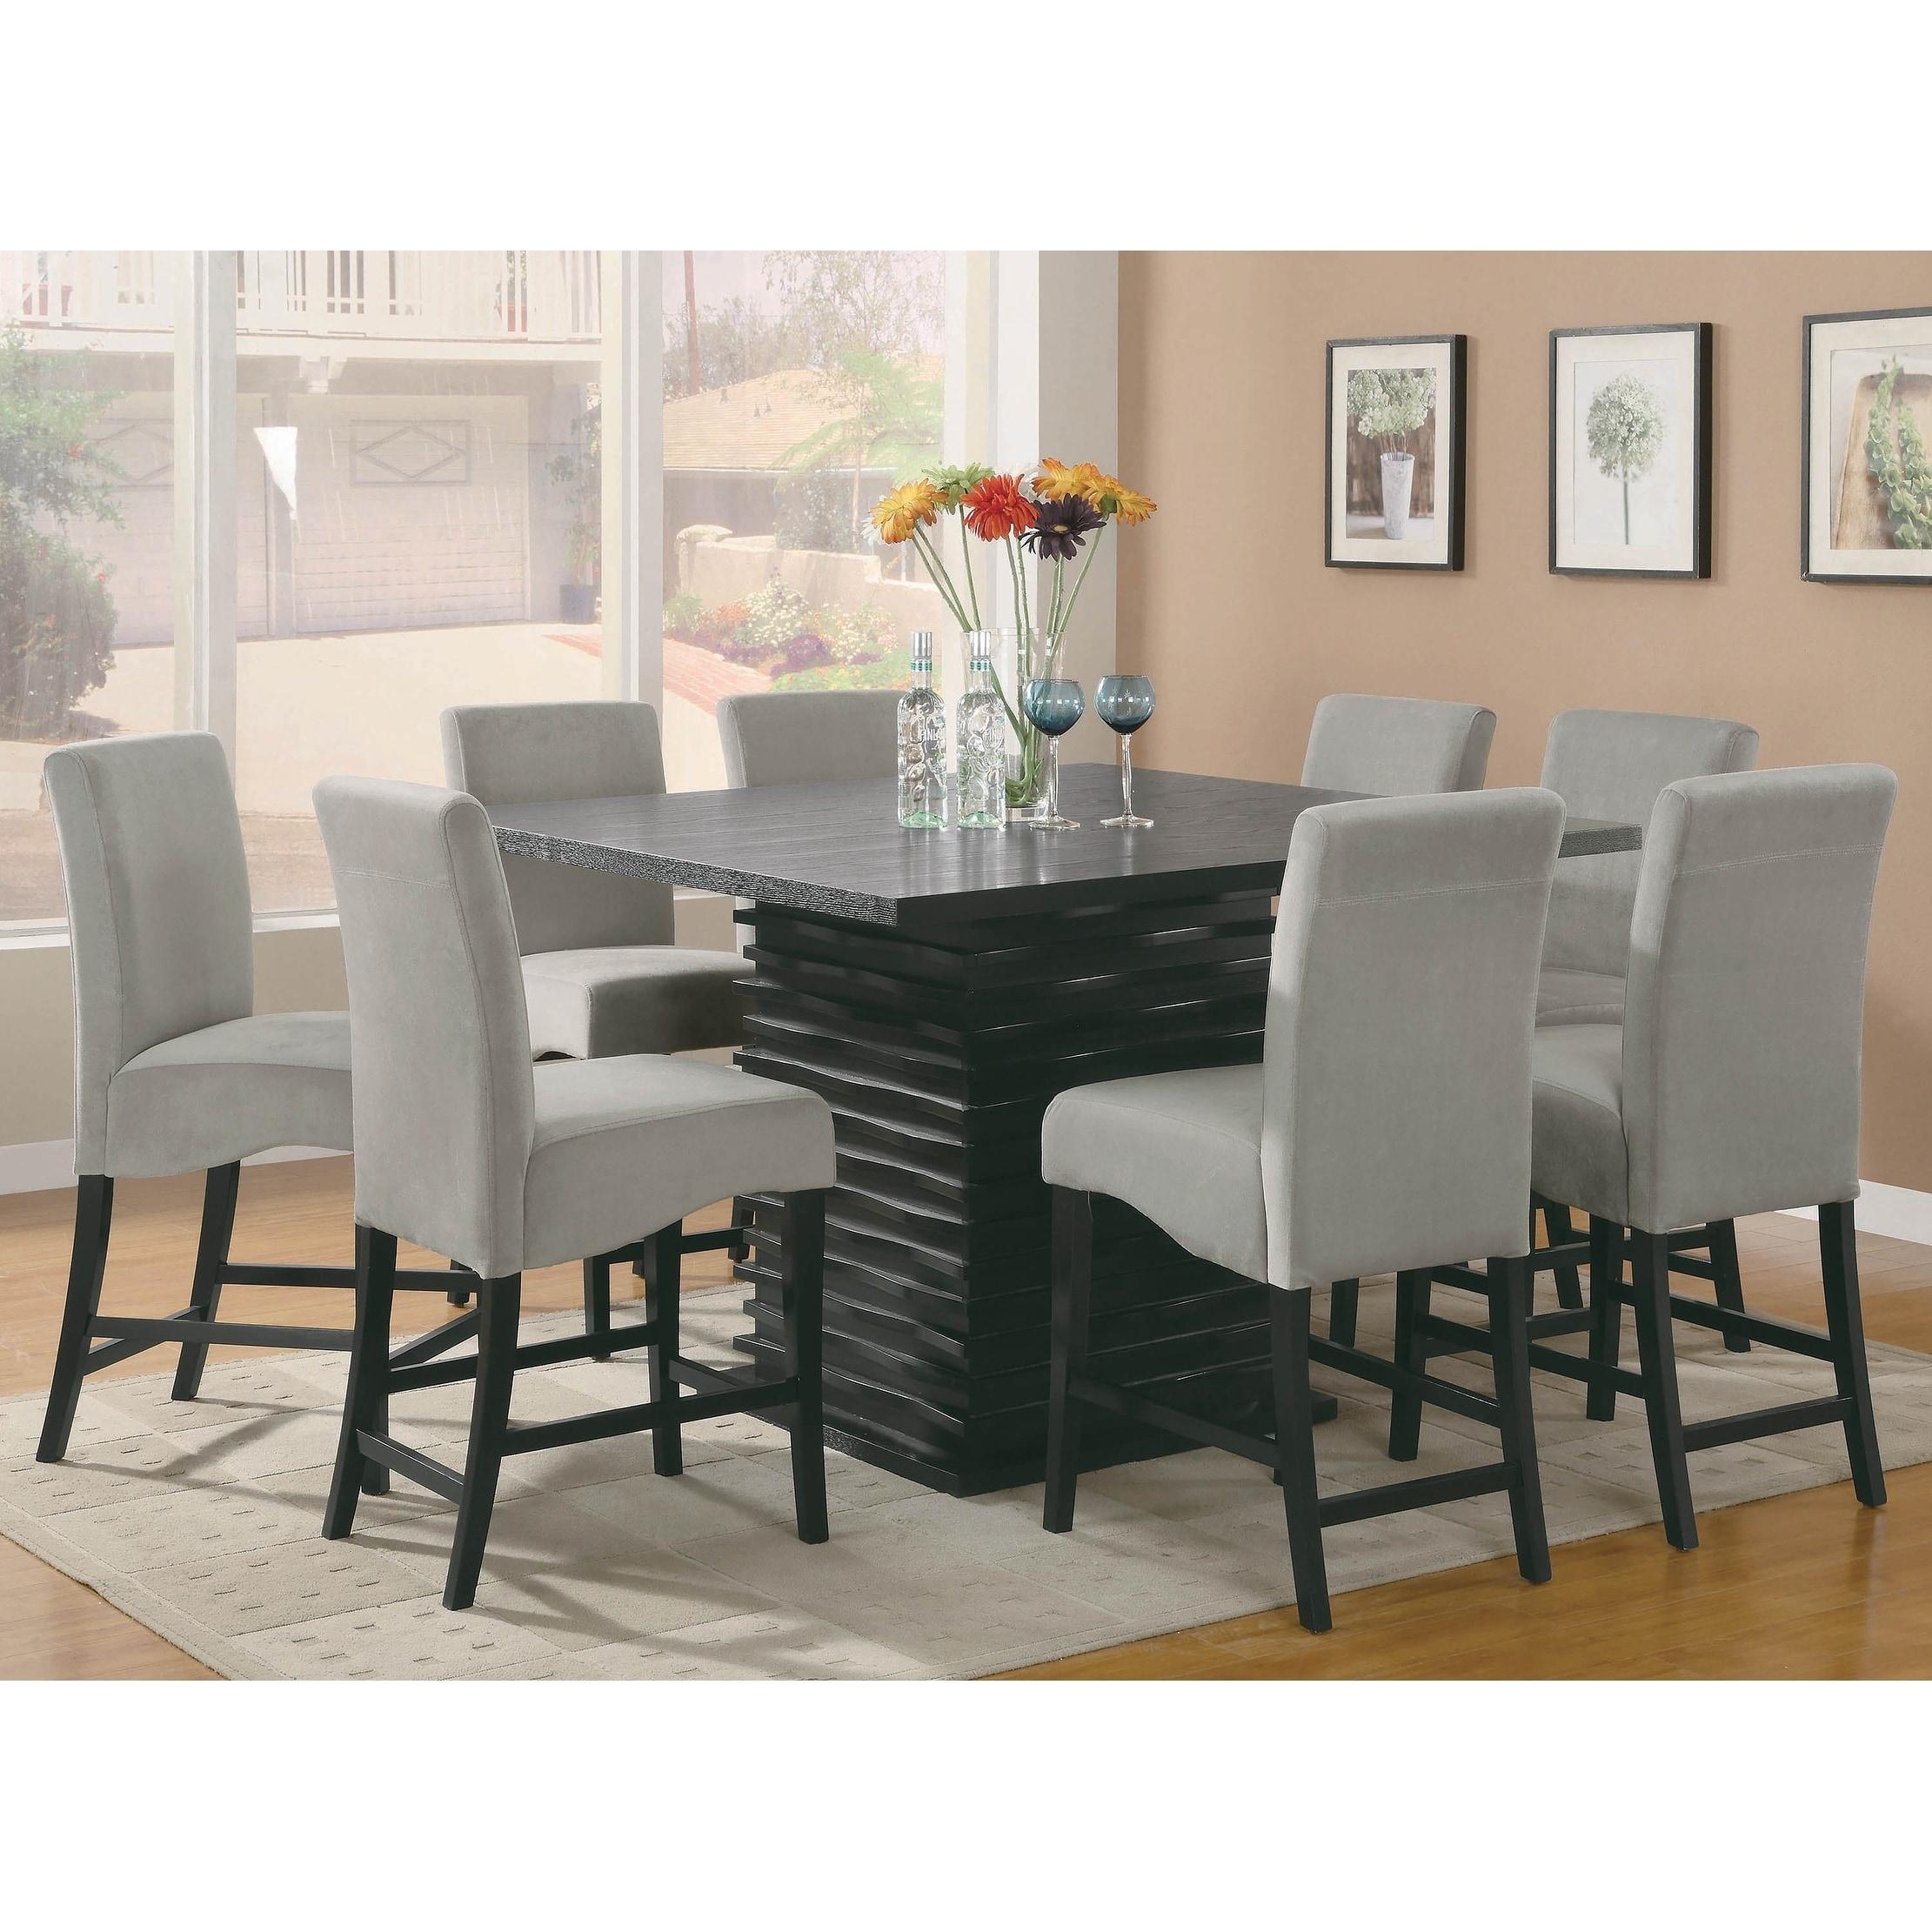 Shandra Dark Grey And Black 7 Piece Counter Height Dining Set Overstock 28527211